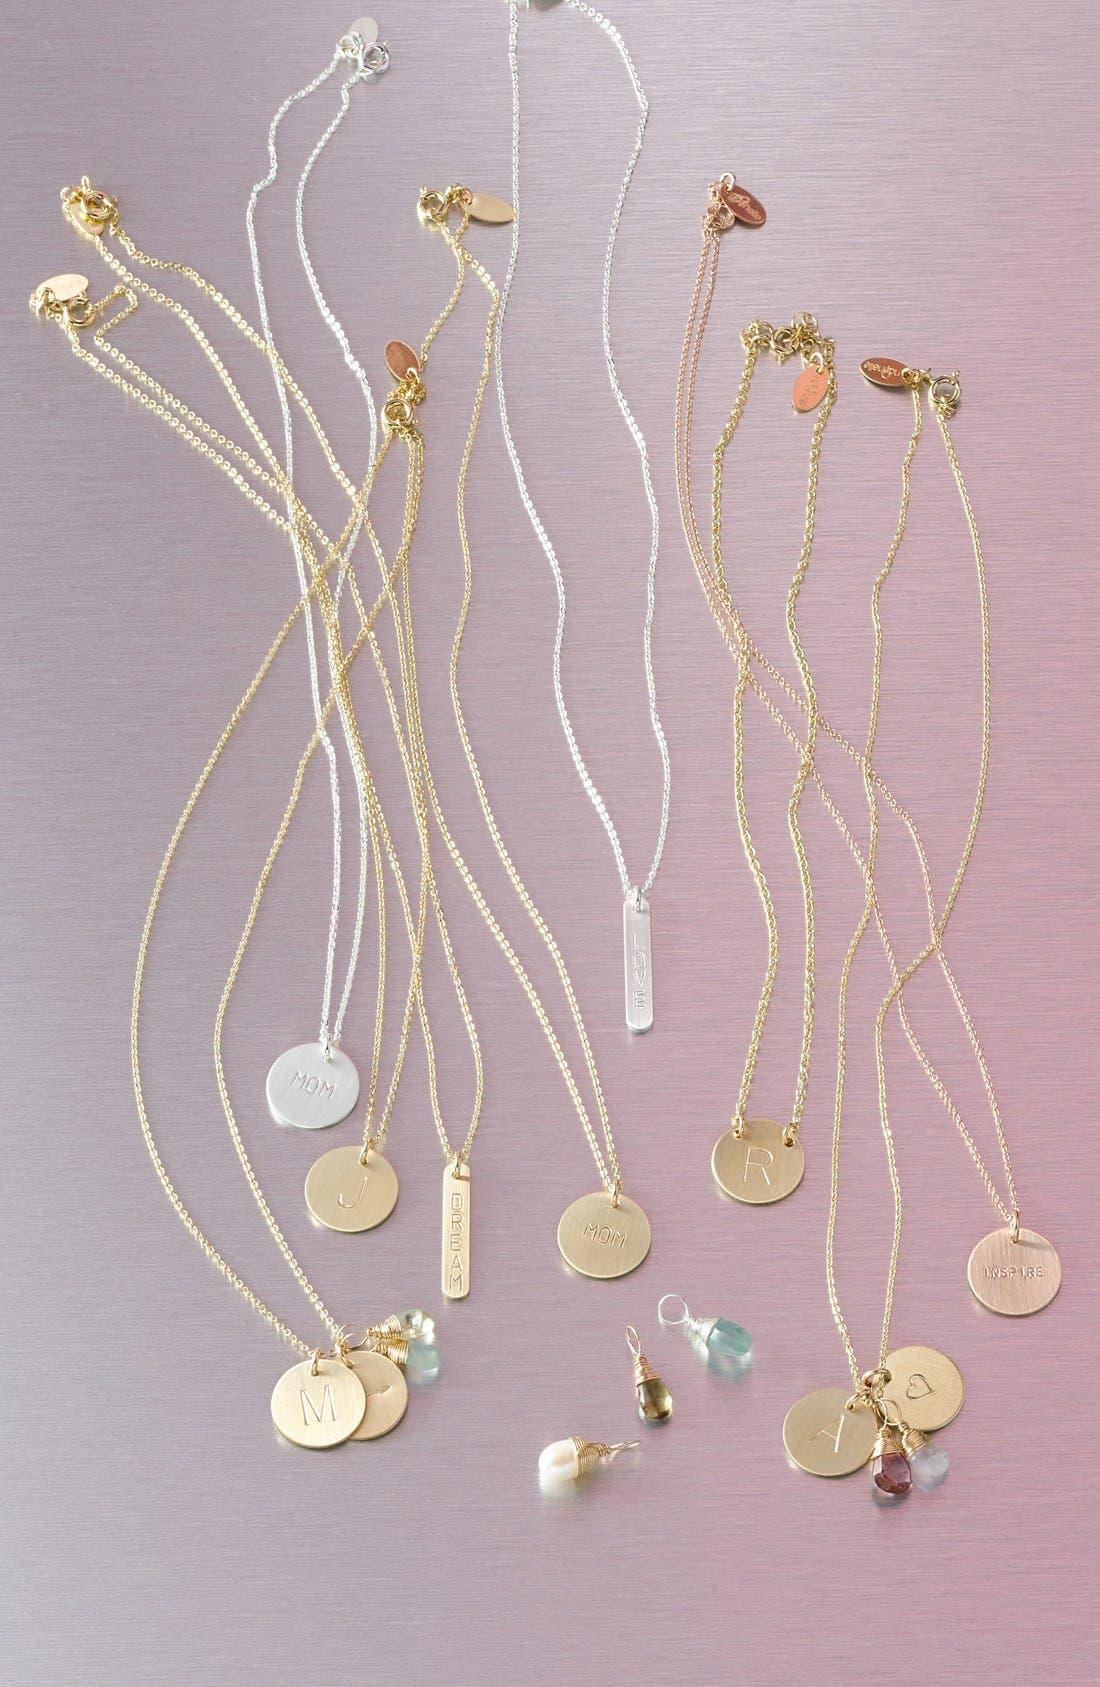 14k-Rose Gold Fill & Semiprecious Stone Charm,                             Alternate thumbnail 2, color,                             GARNET